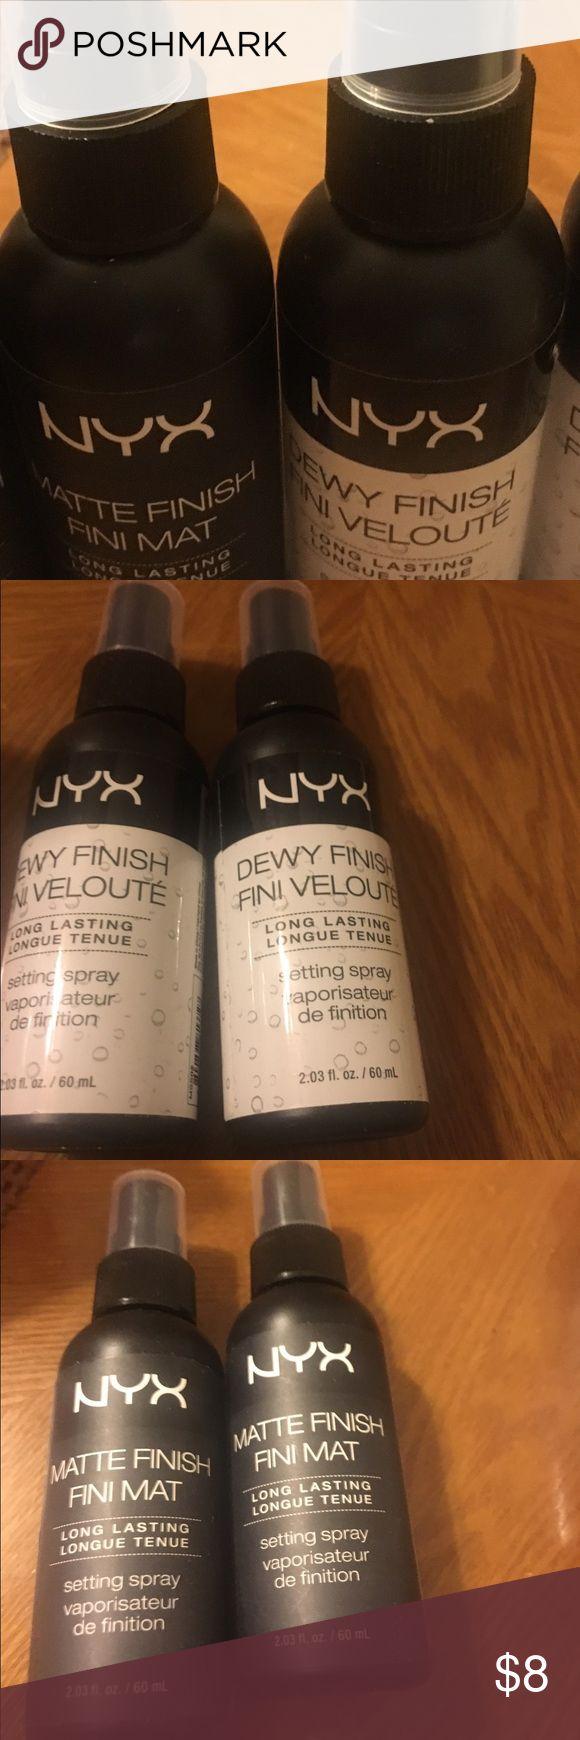 NYX Finish Spray Matte or Dewy Finish Spray 2 FOR 8.00 🛑 NYX Makeup Luminizer